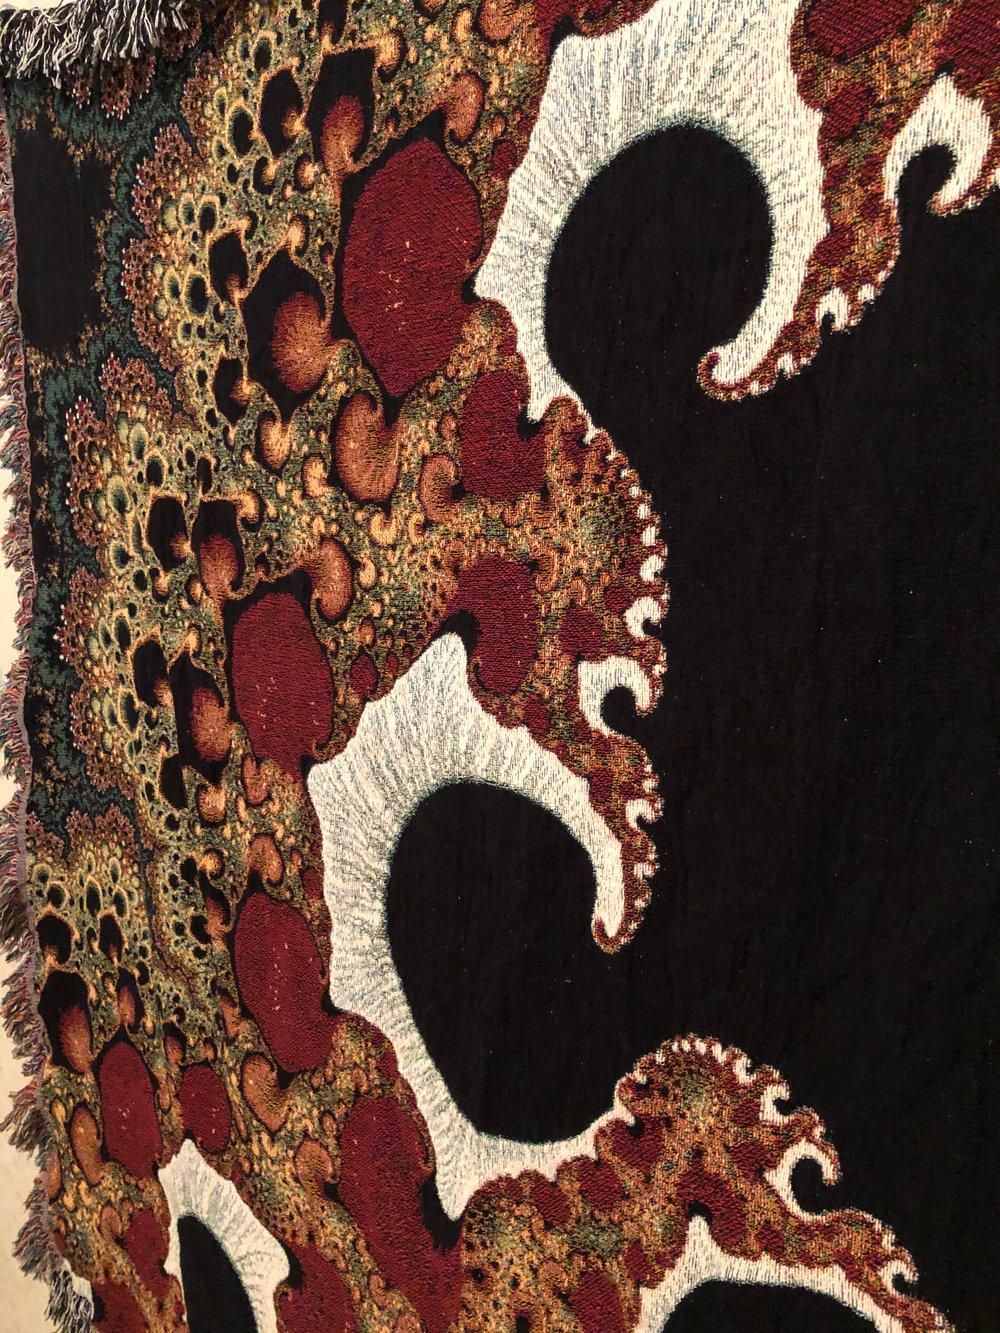 Woven Blanket #8